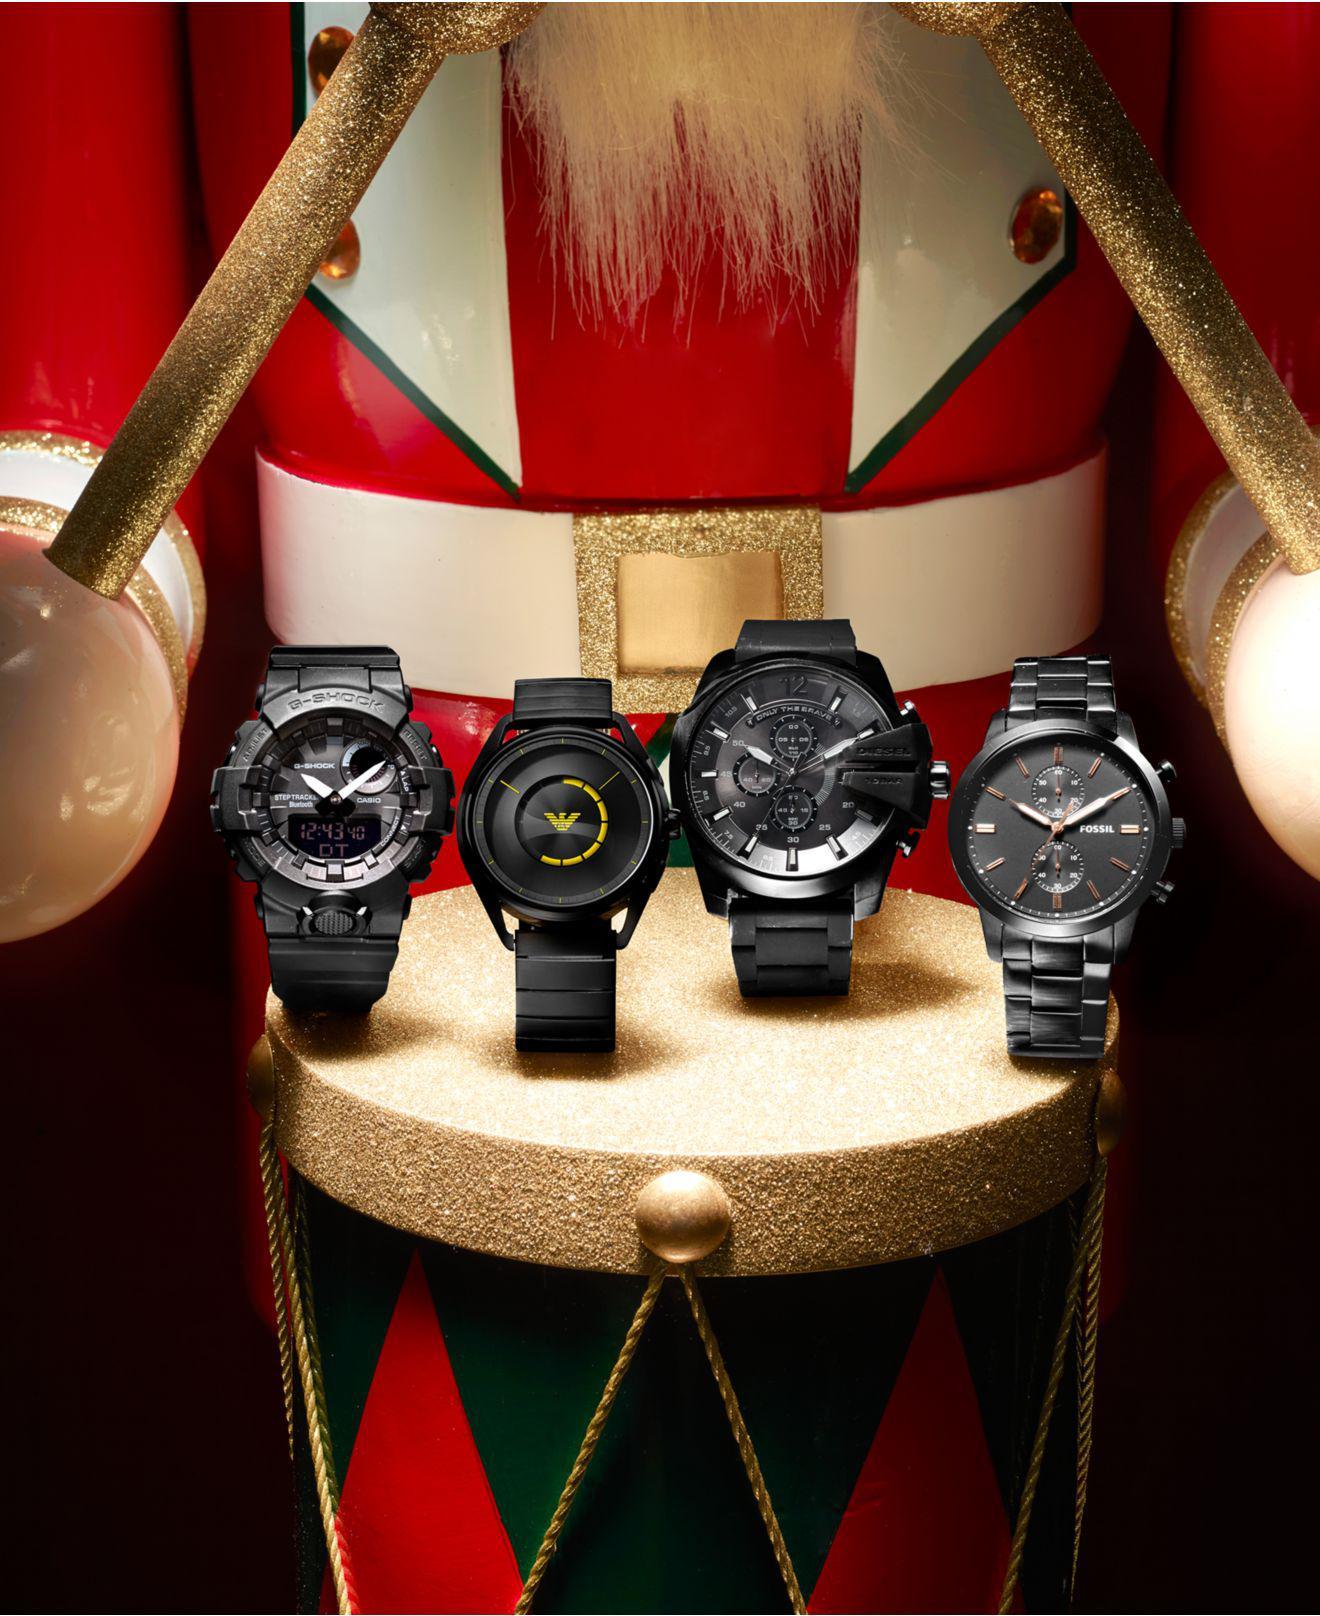 f7306700a Ammcobus || Men's the minimalist black stainless steel bracelet ...